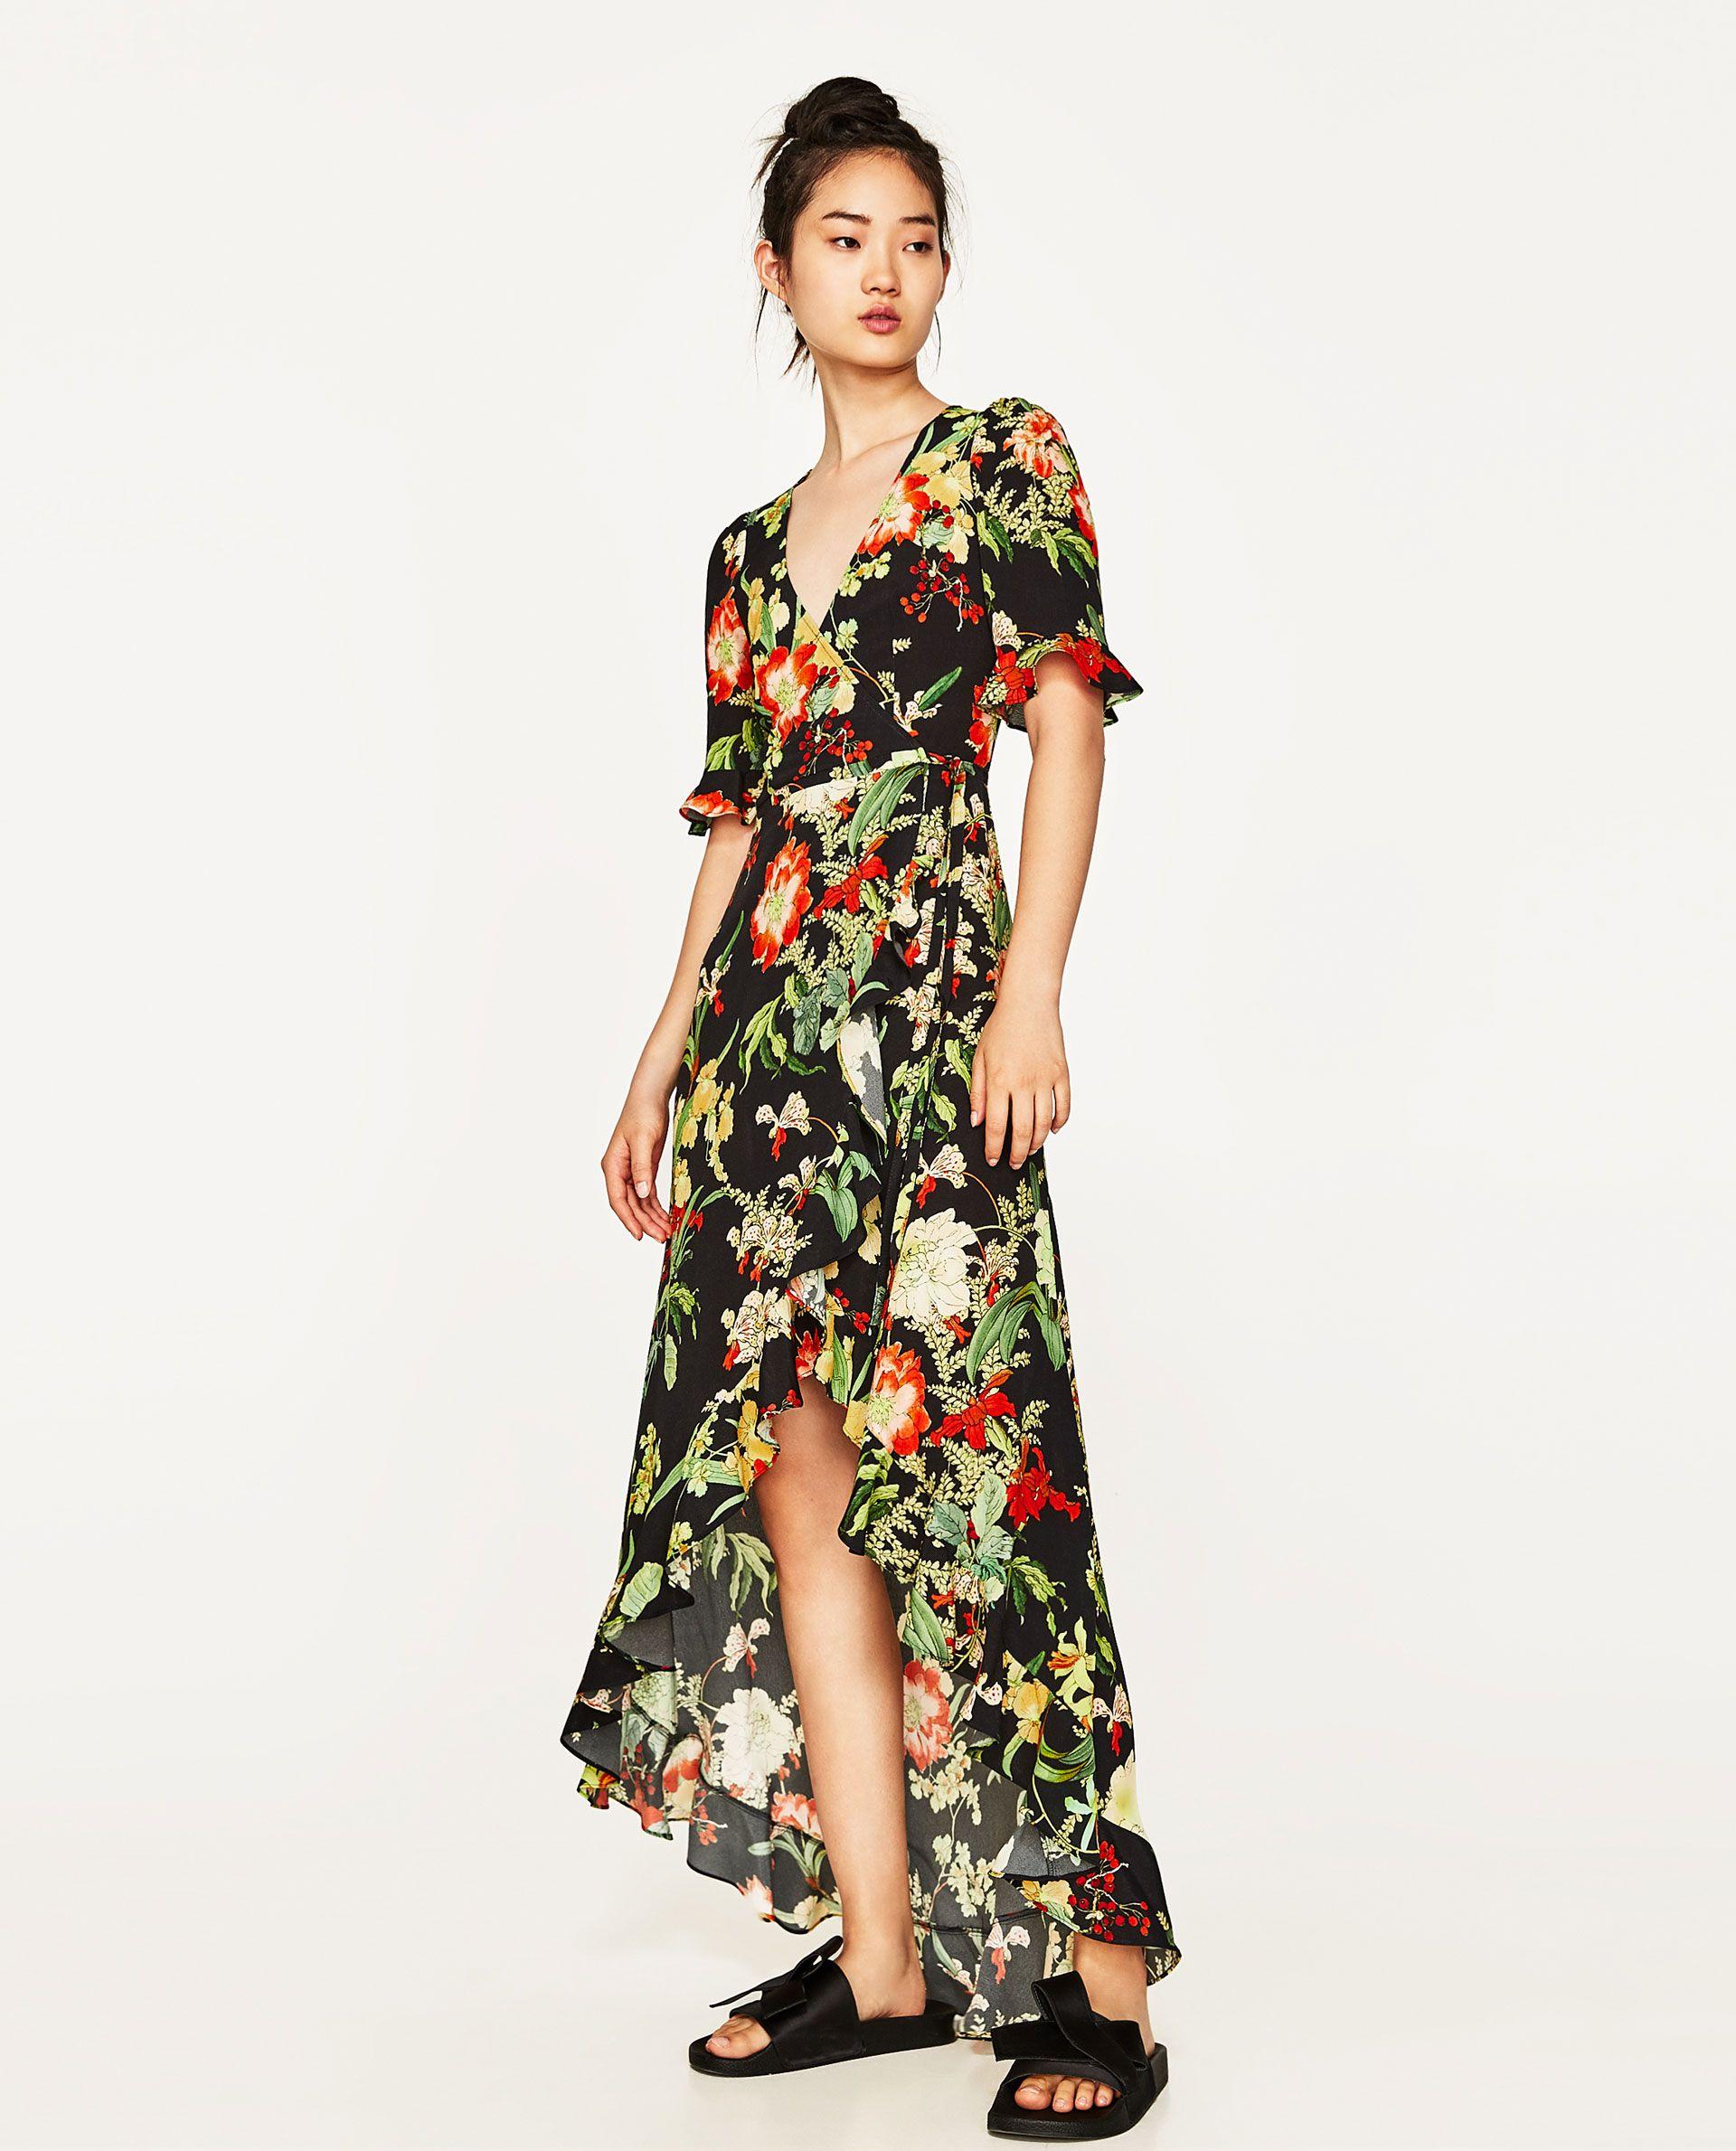 bc00af3a32 ZARA - WOMAN - LONG FLORAL PRINT DRESS